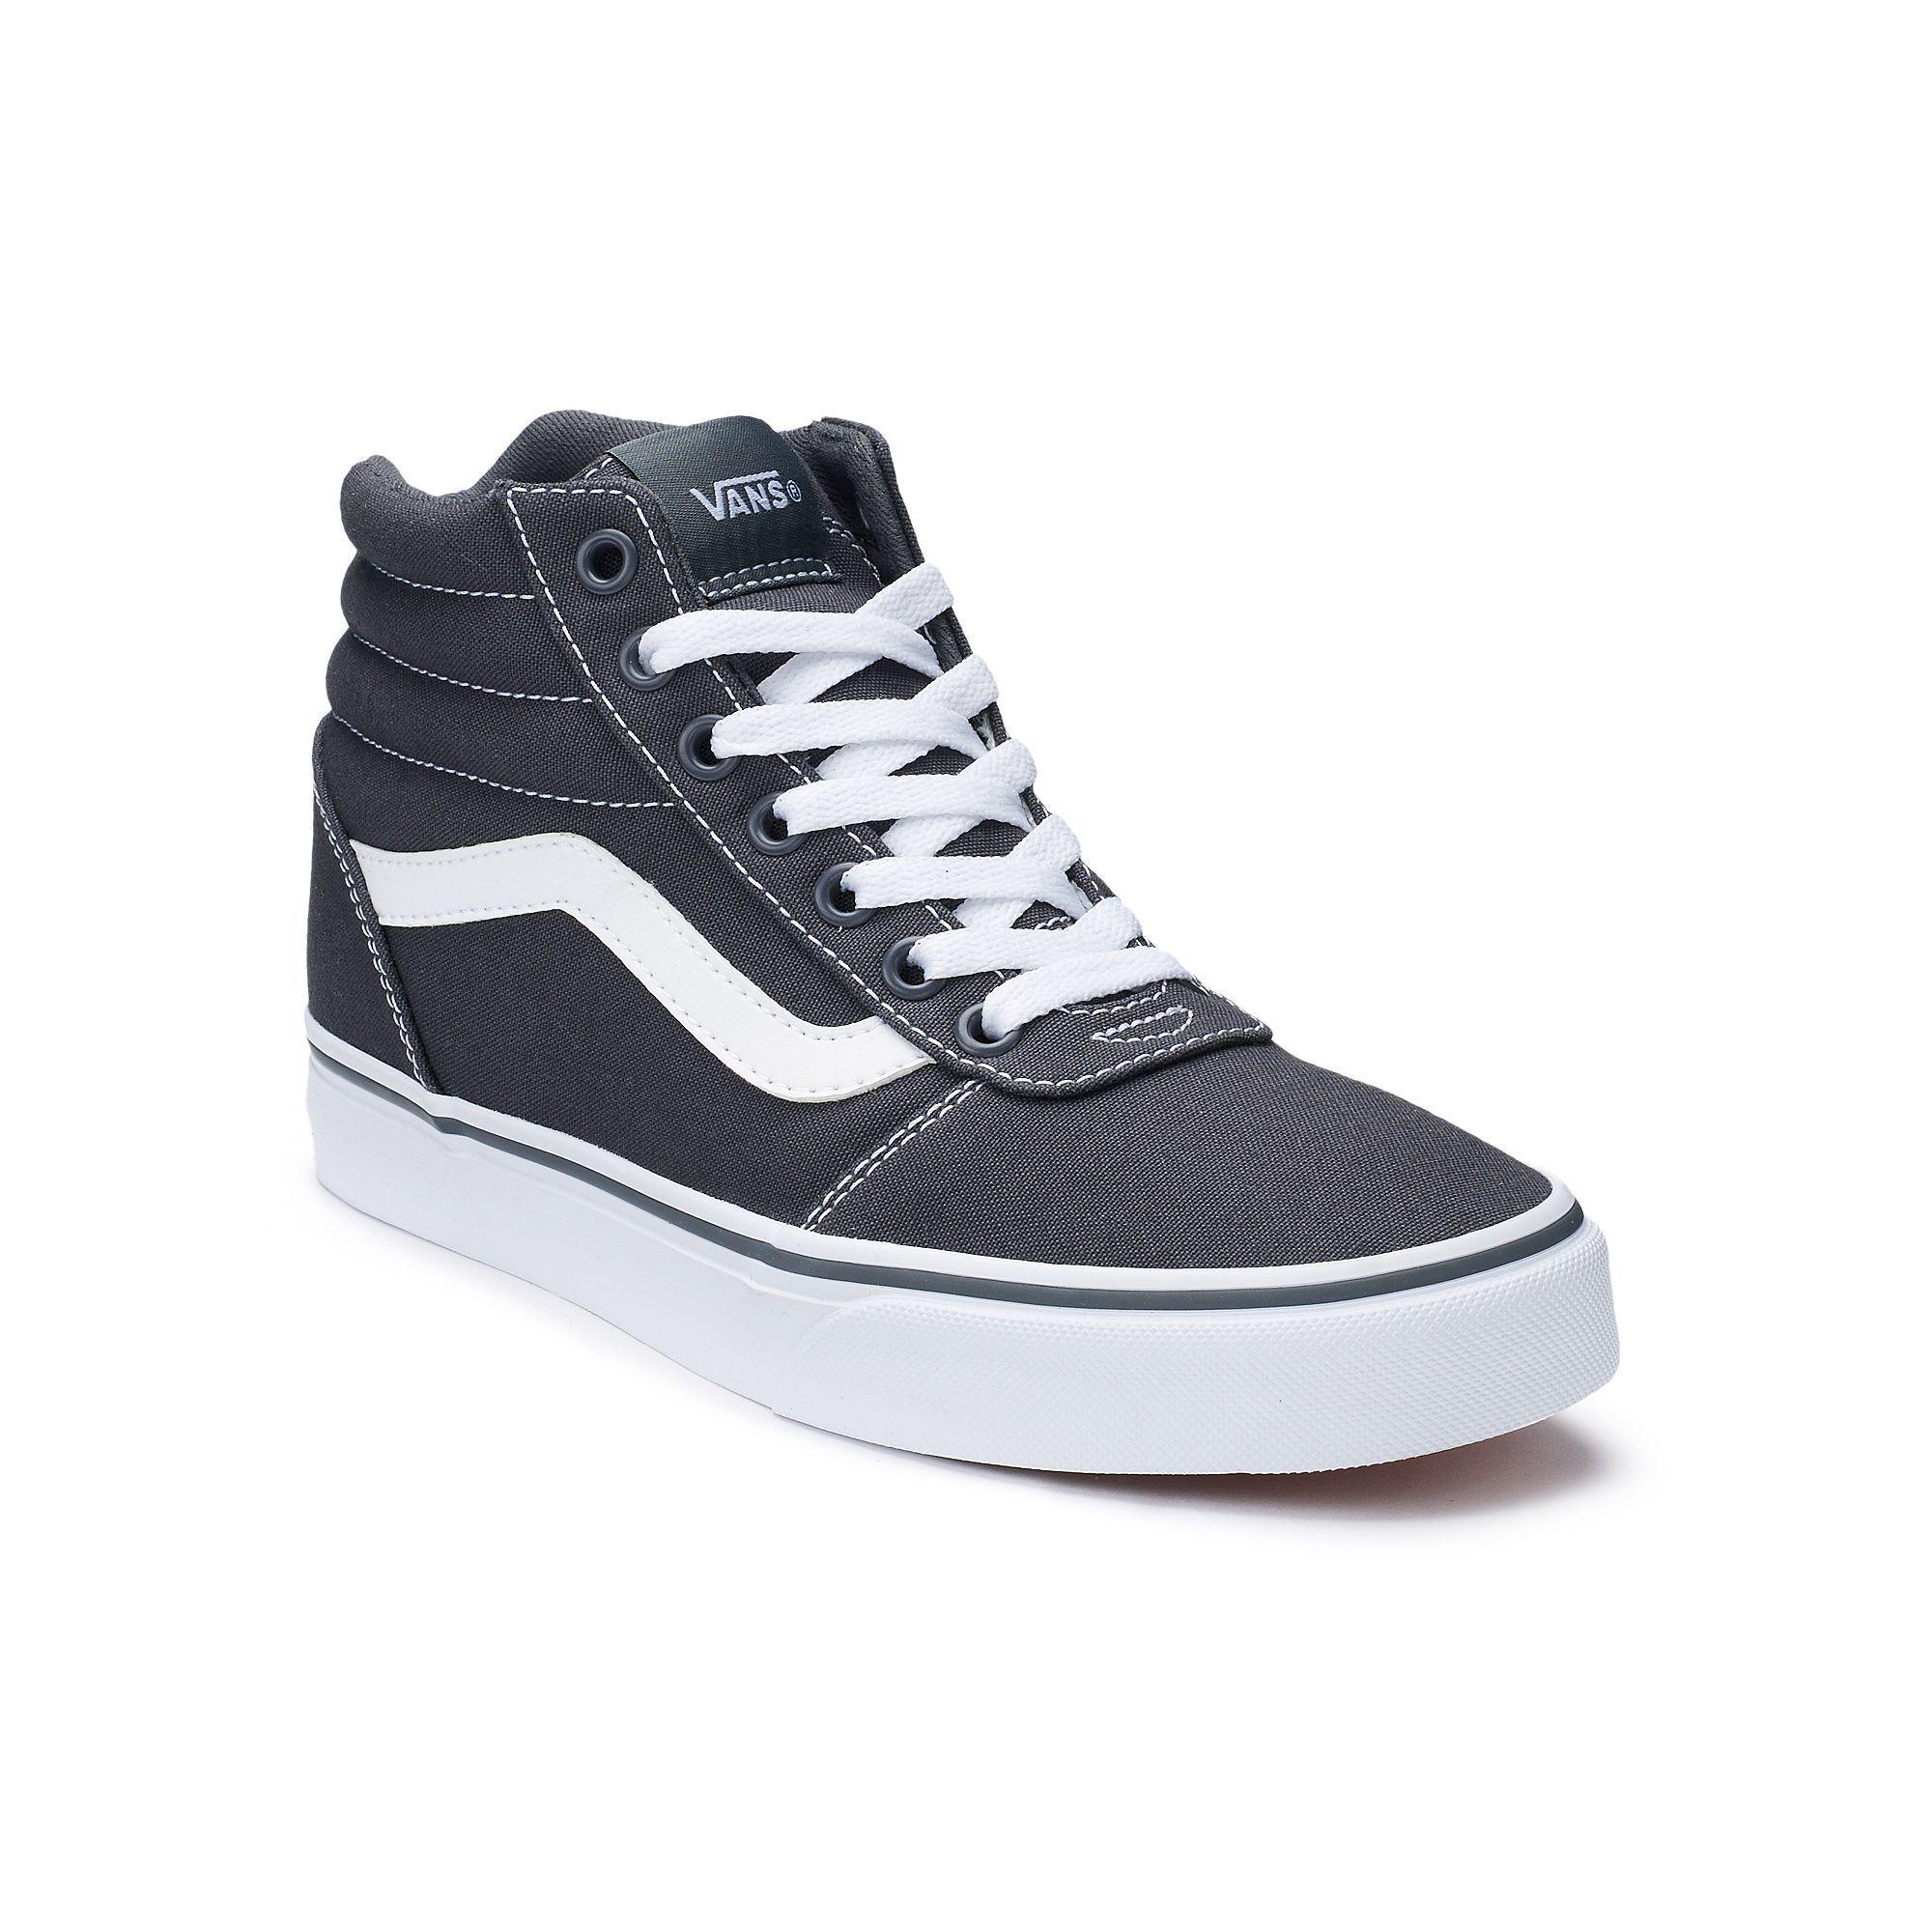 Vans® Ward Hi Women's Skate Shoes | Skate shoes, Shoes, Gray